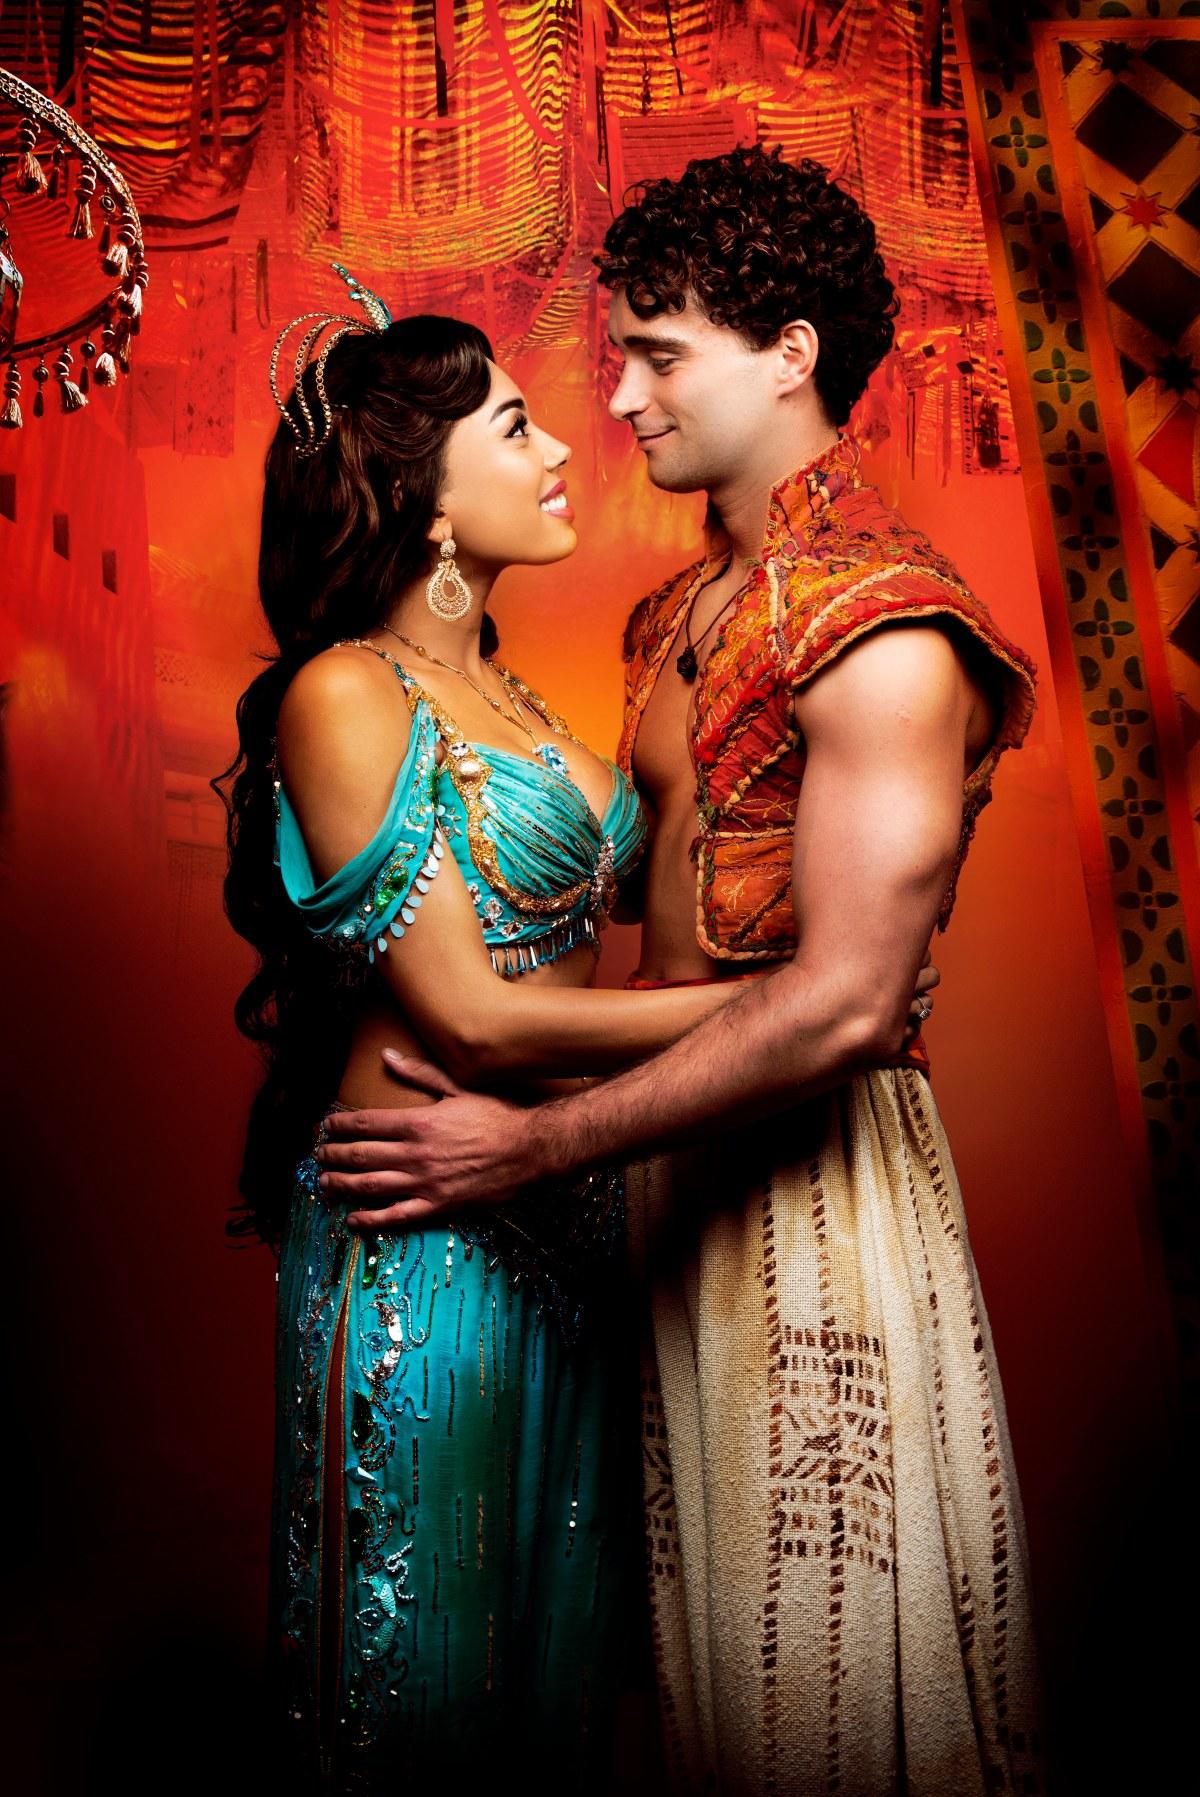 Aladdin - Prince Edward Theatre. Matthew Croke (Aladdin) and Jade Ewen (Jasmine) © Disney 10299